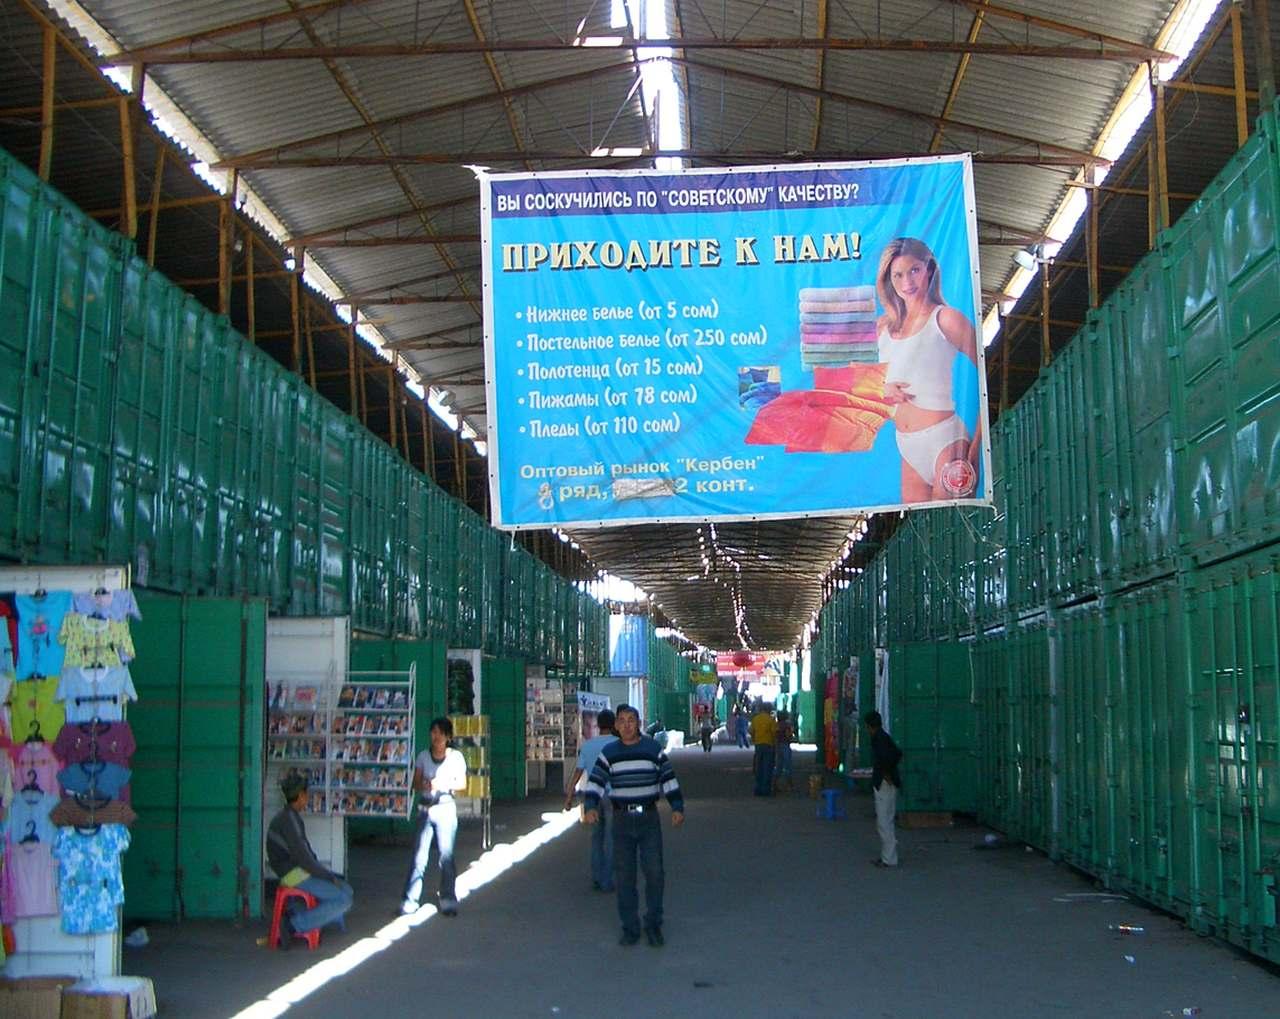 Dordoi (one of hundreds of rows of stalls